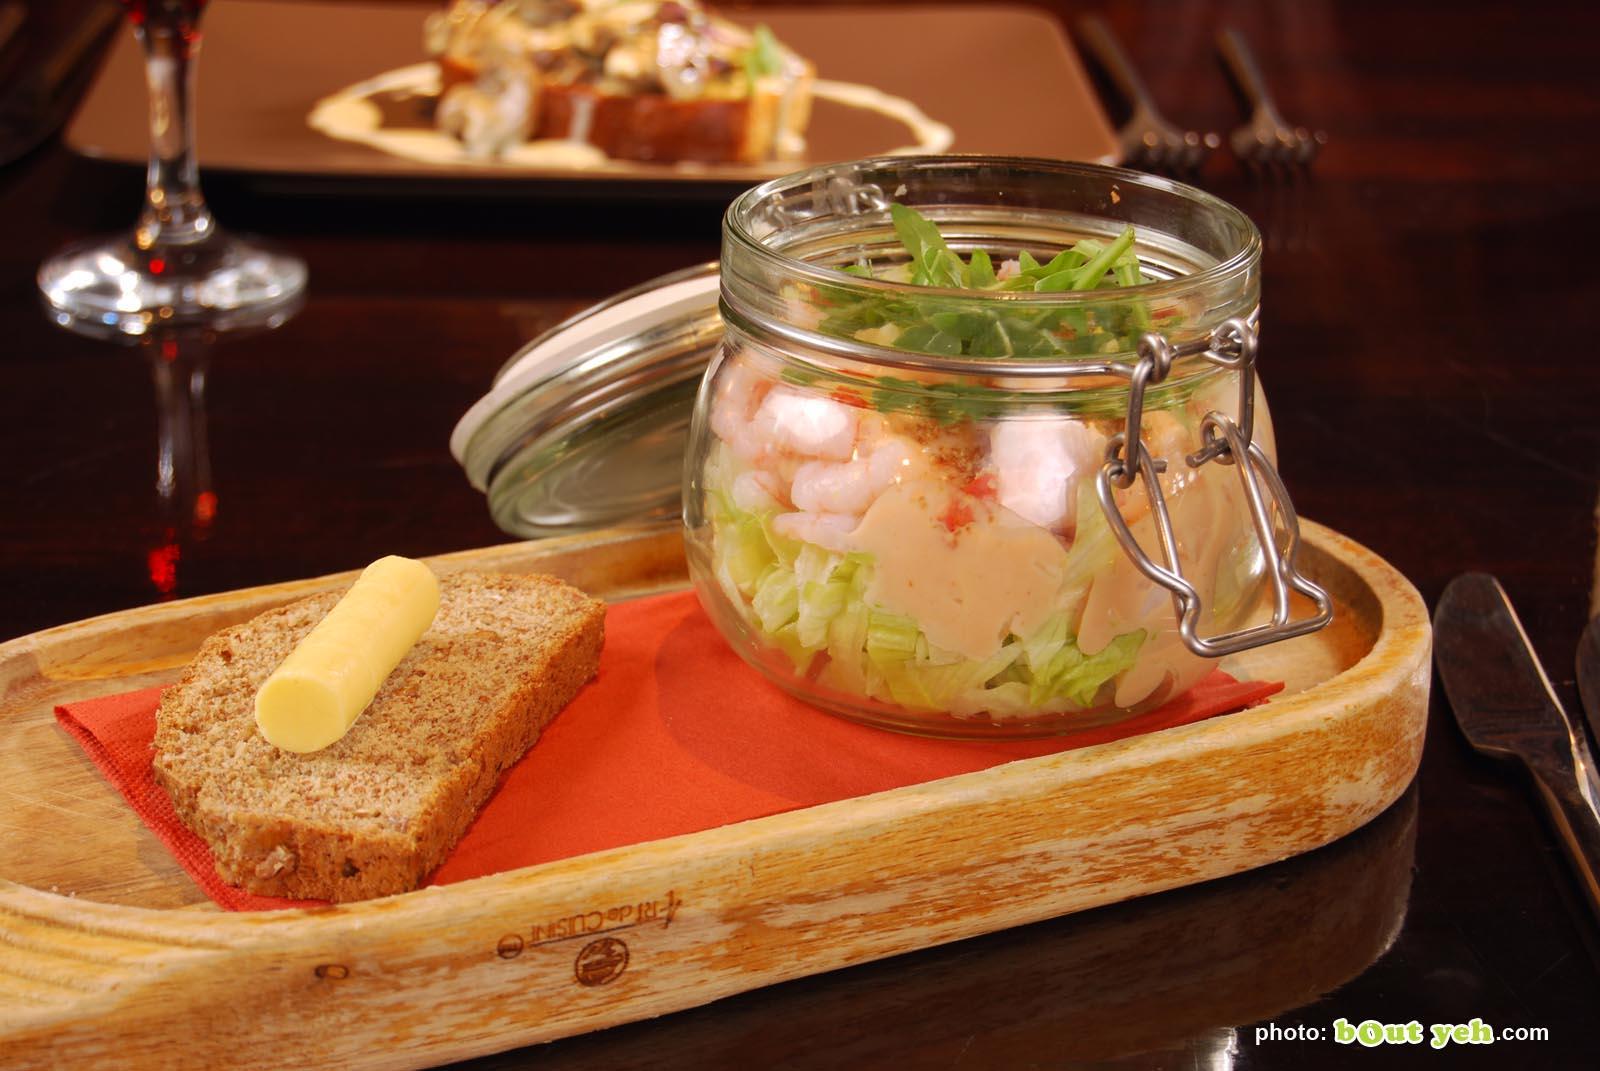 Food photographers Belfast portfolio photo 0830 - prawn cocktail with wheaten bread